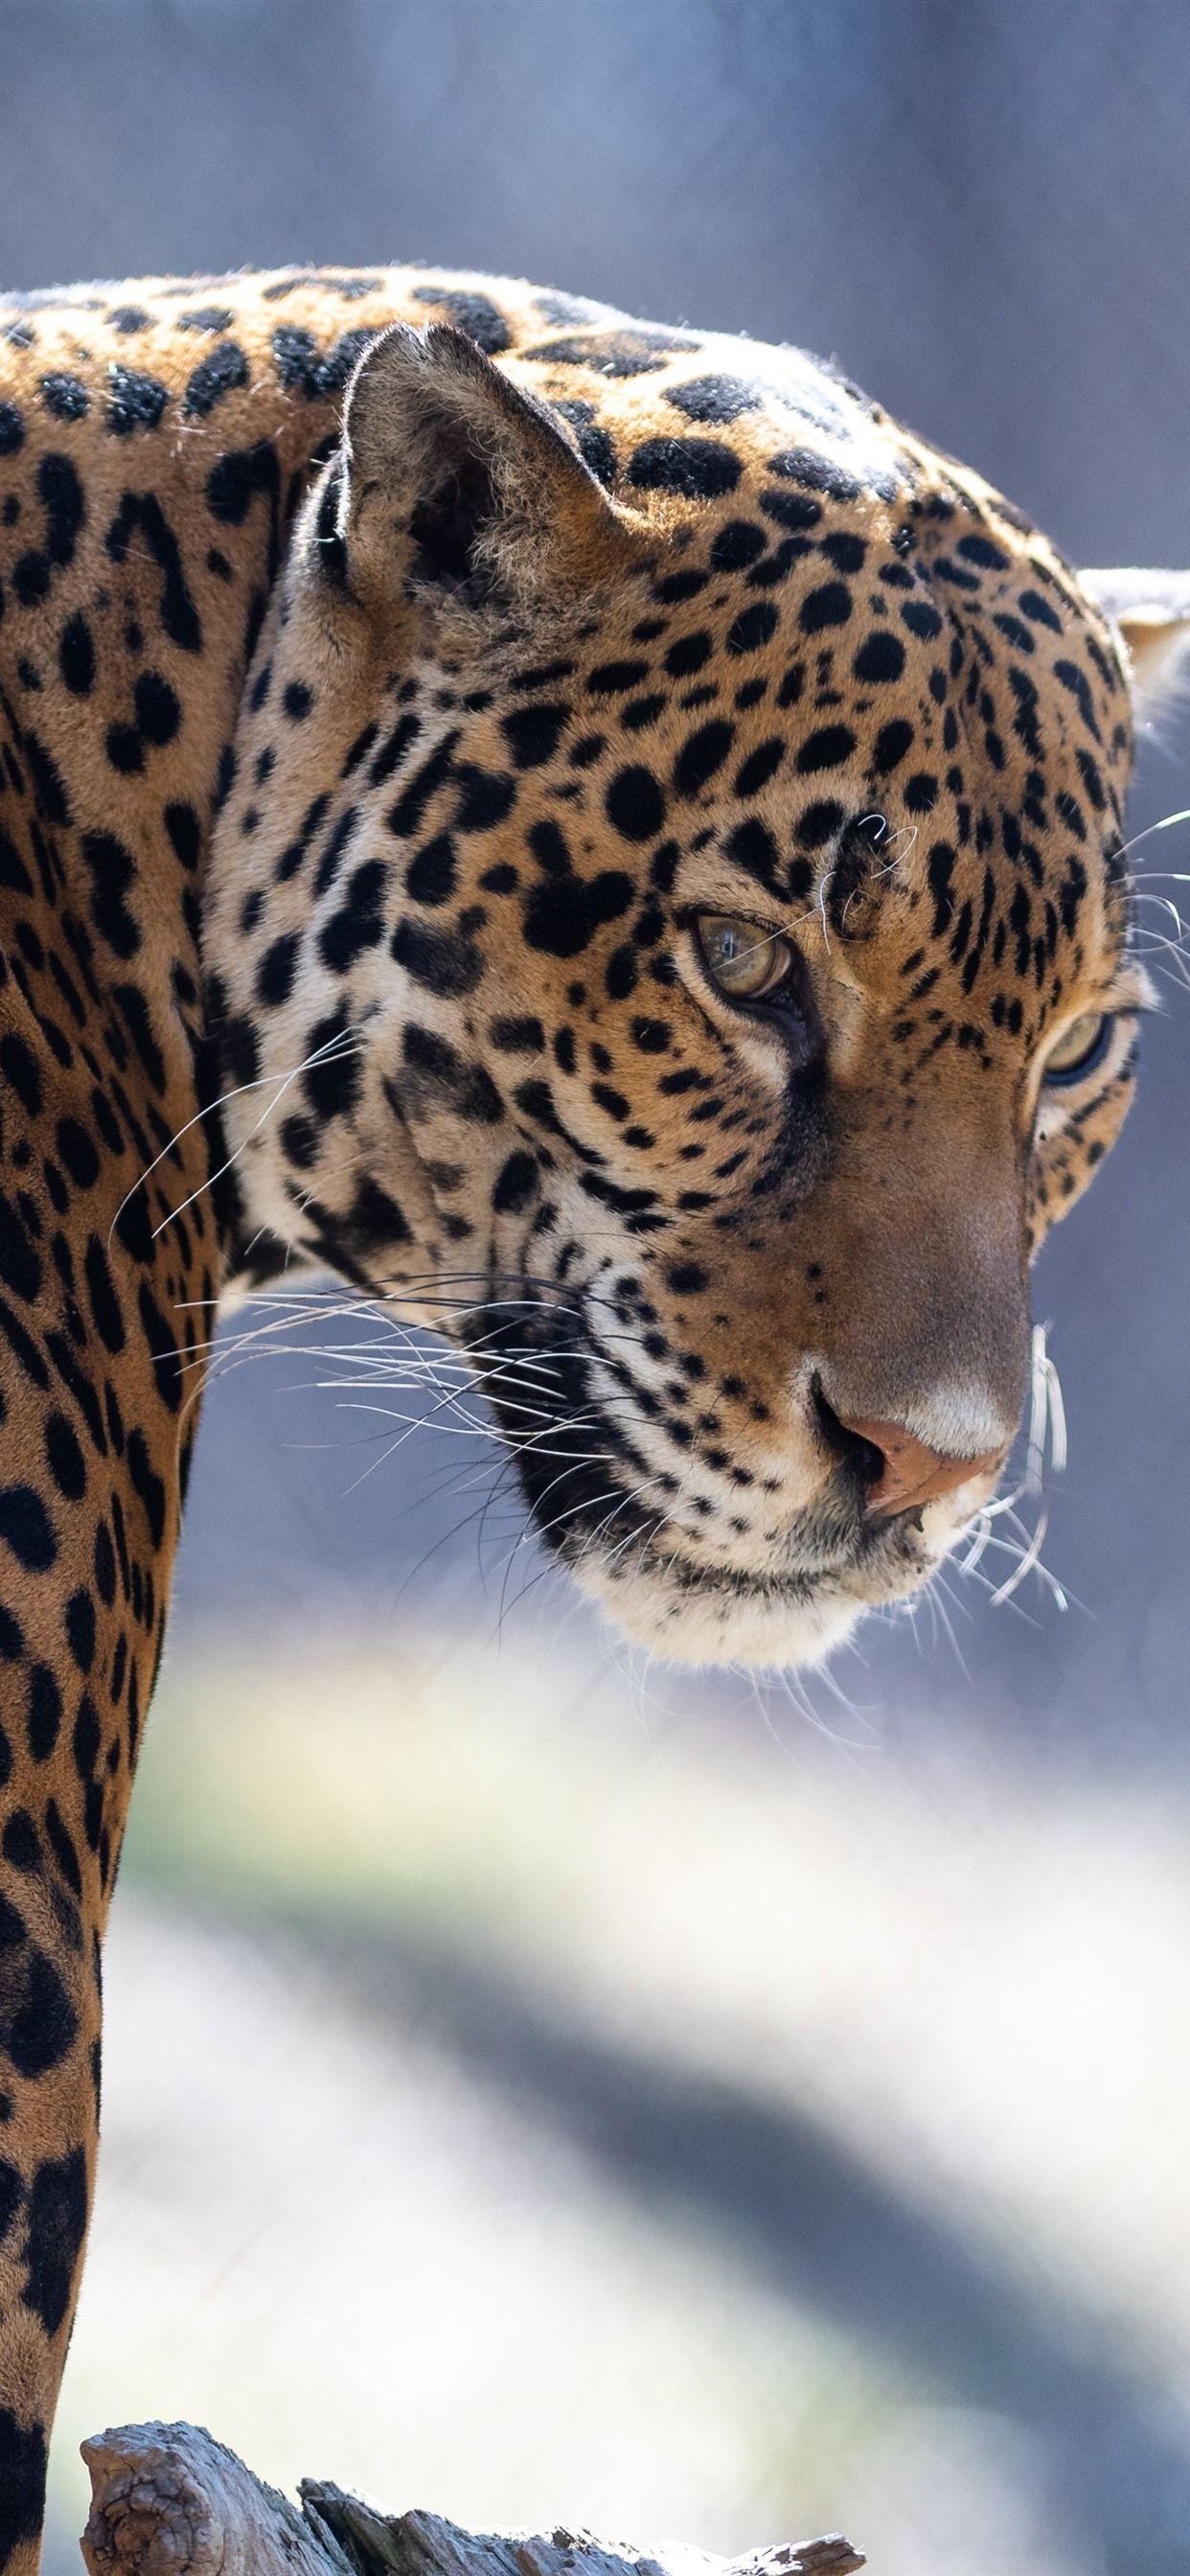 Jaguar Iphone Wallpapers Top Free Jaguar Iphone Backgrounds Wallpaperaccess